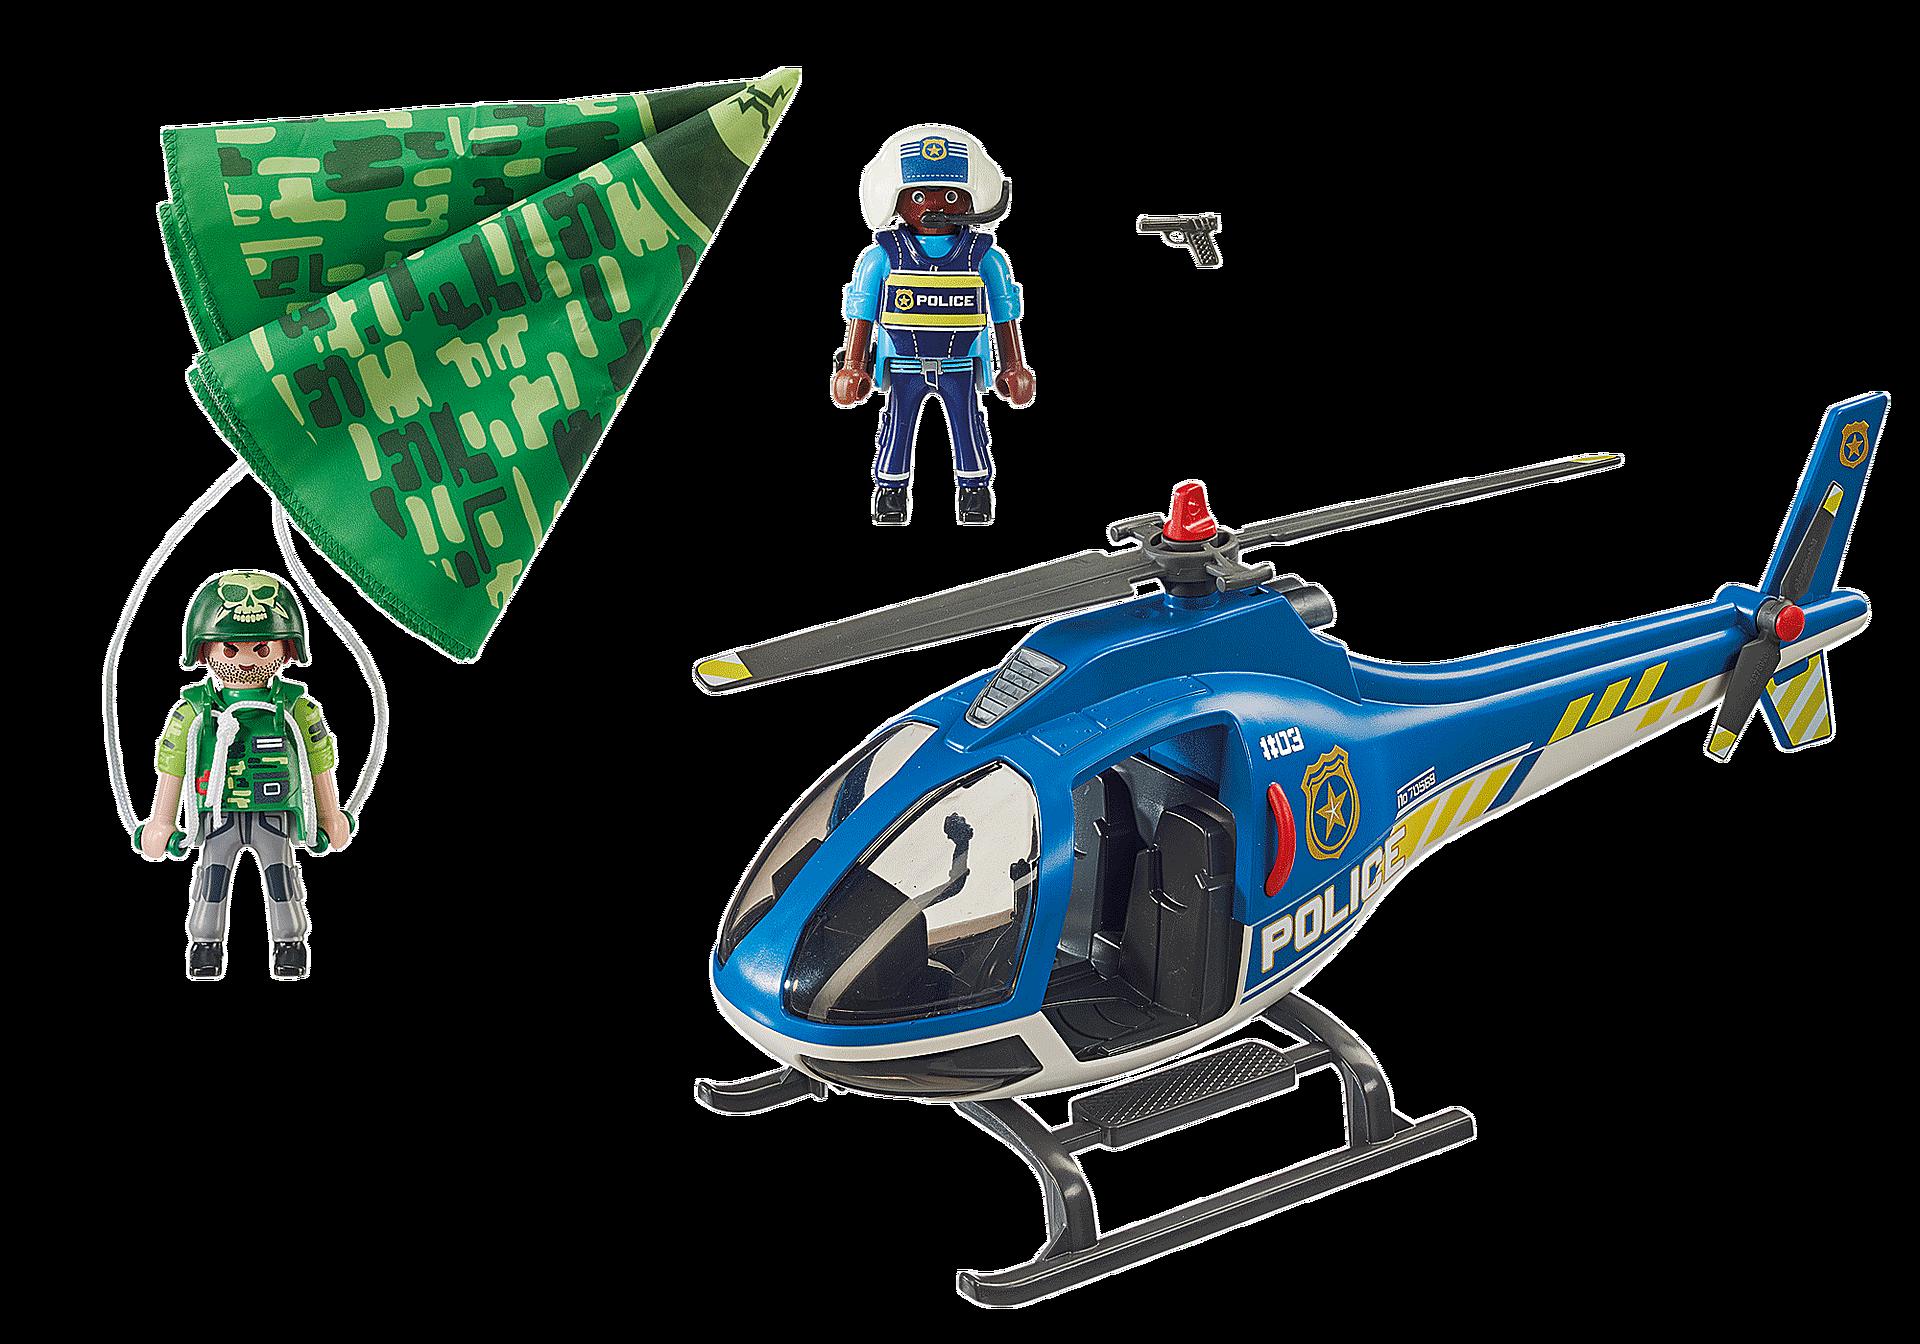 70569 Politiehelikopter: parachute-achtervolging zoom image3